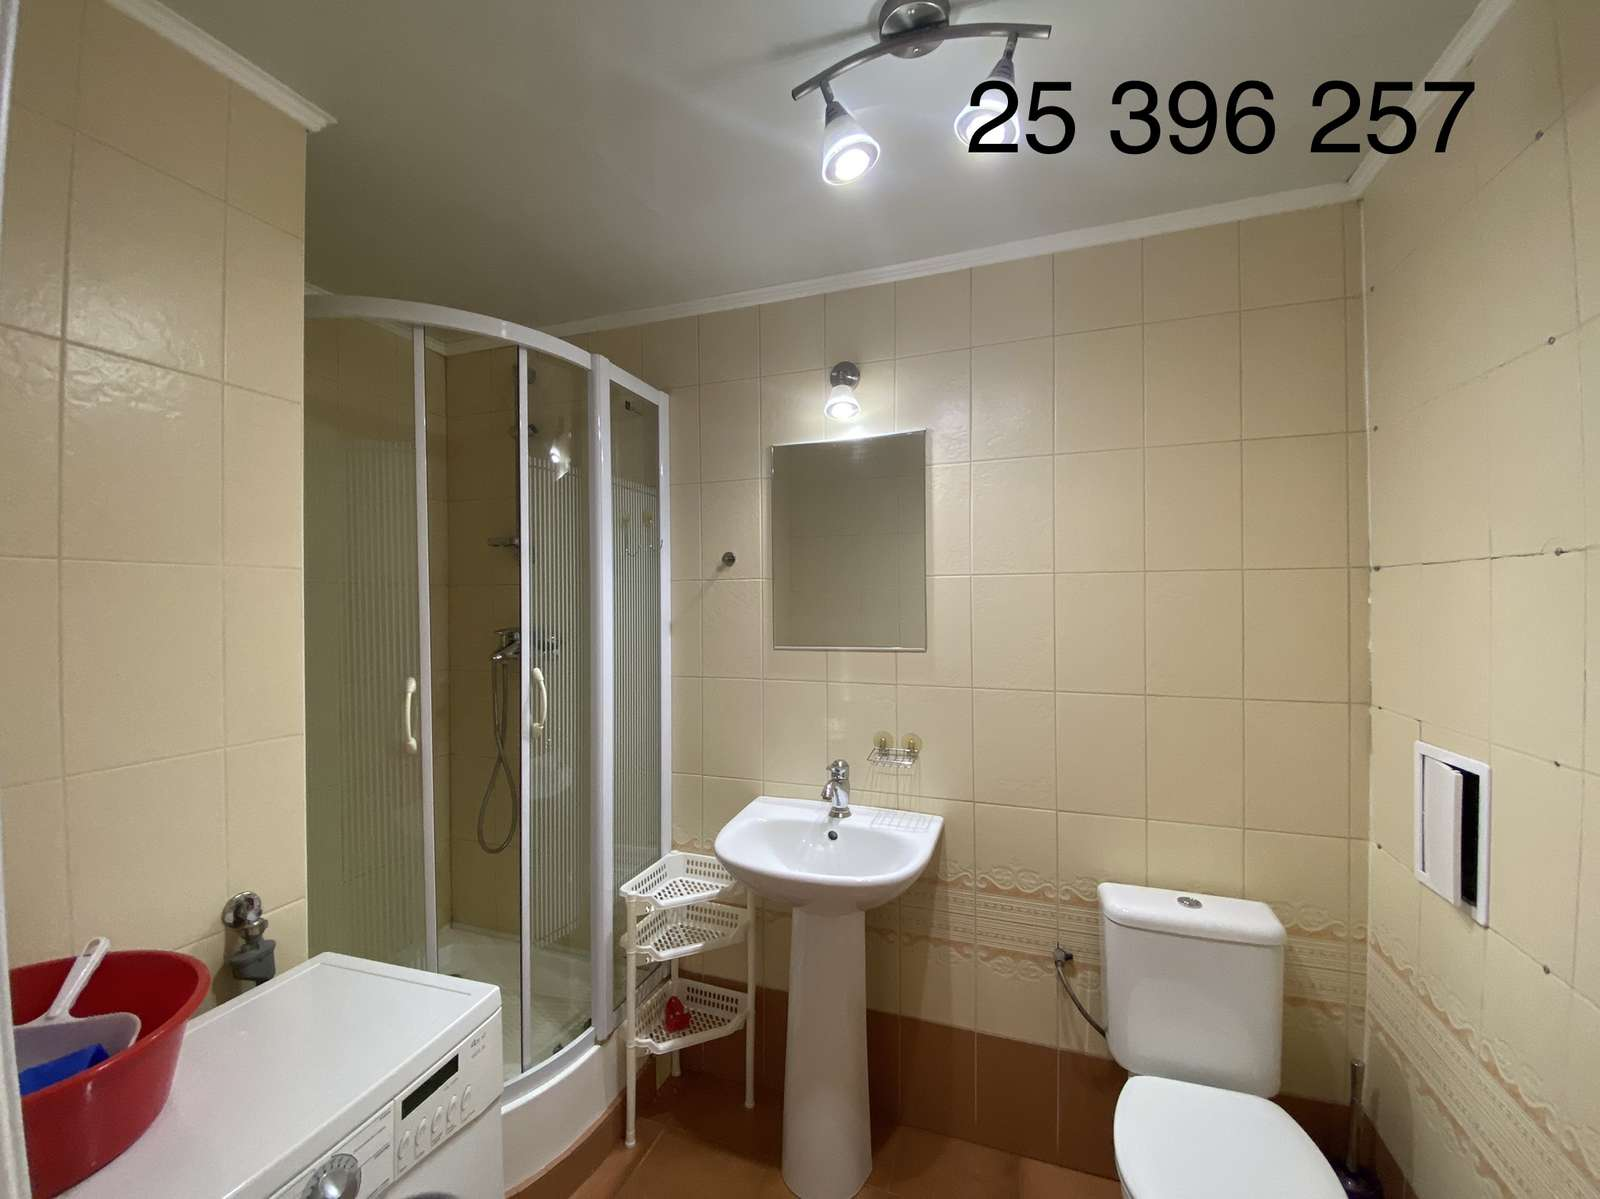 Аренда 1-комнатной квартиры, Самара, Ново-Садовая улица,  дом 23